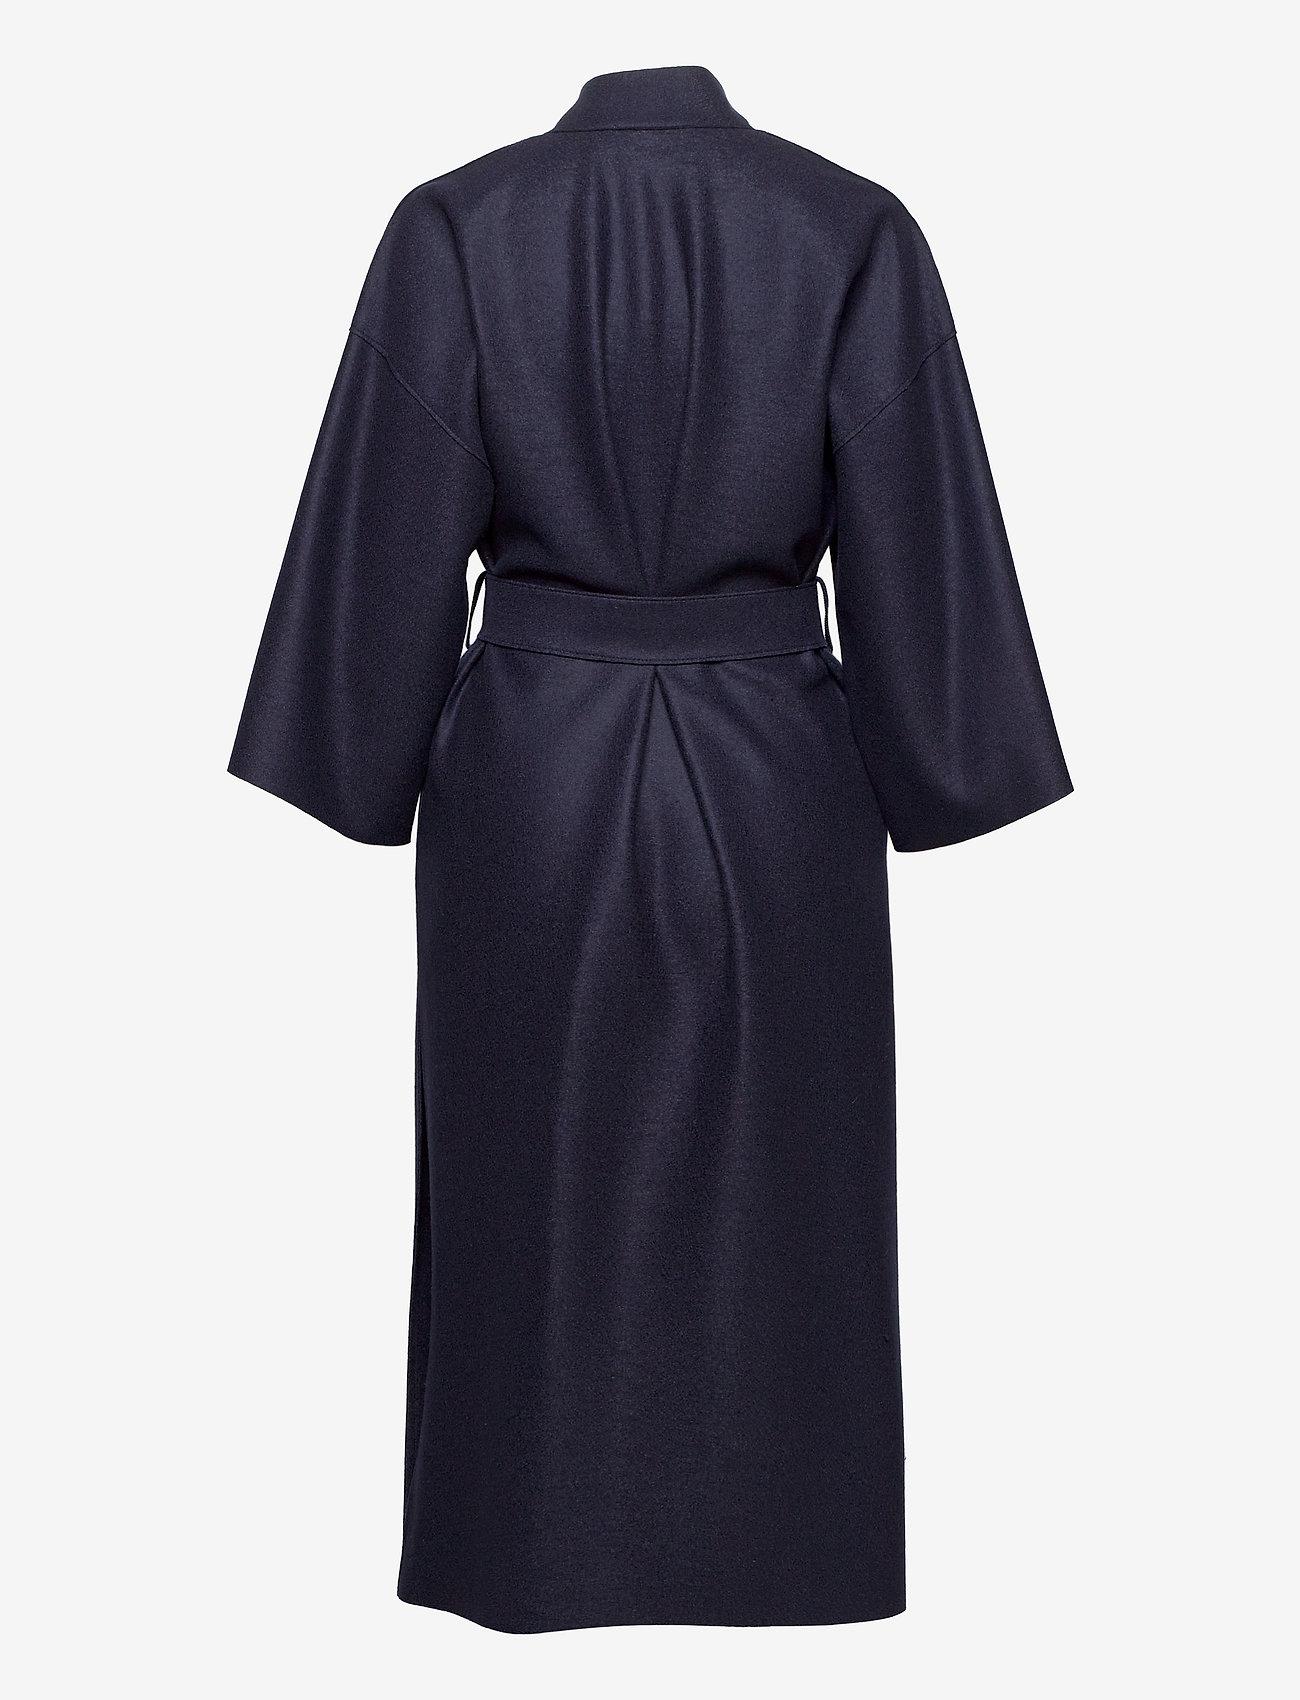 Harris Wharf London - Women Kimono Coat With Vents Light Pressed Wool - wollmäntel - navy blue - 1